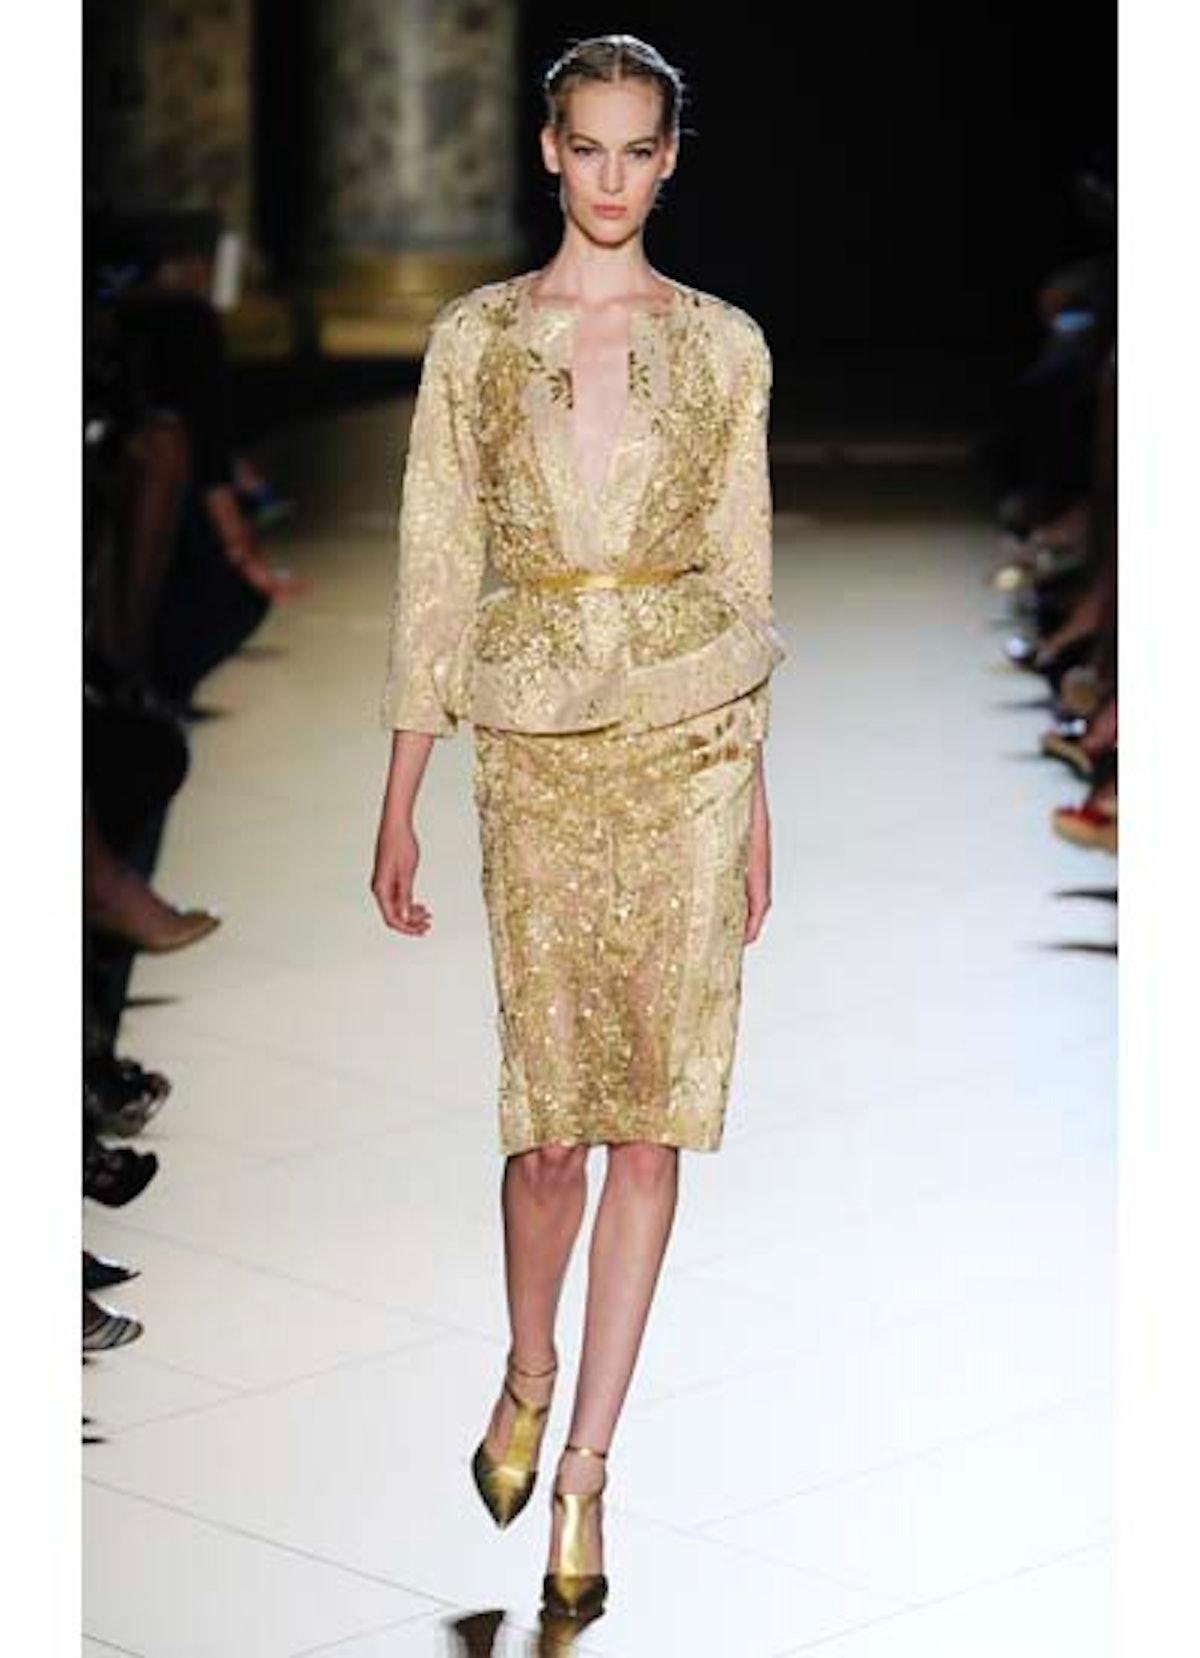 fass-elie-saab-couture-2012-runway-37-v.jpg